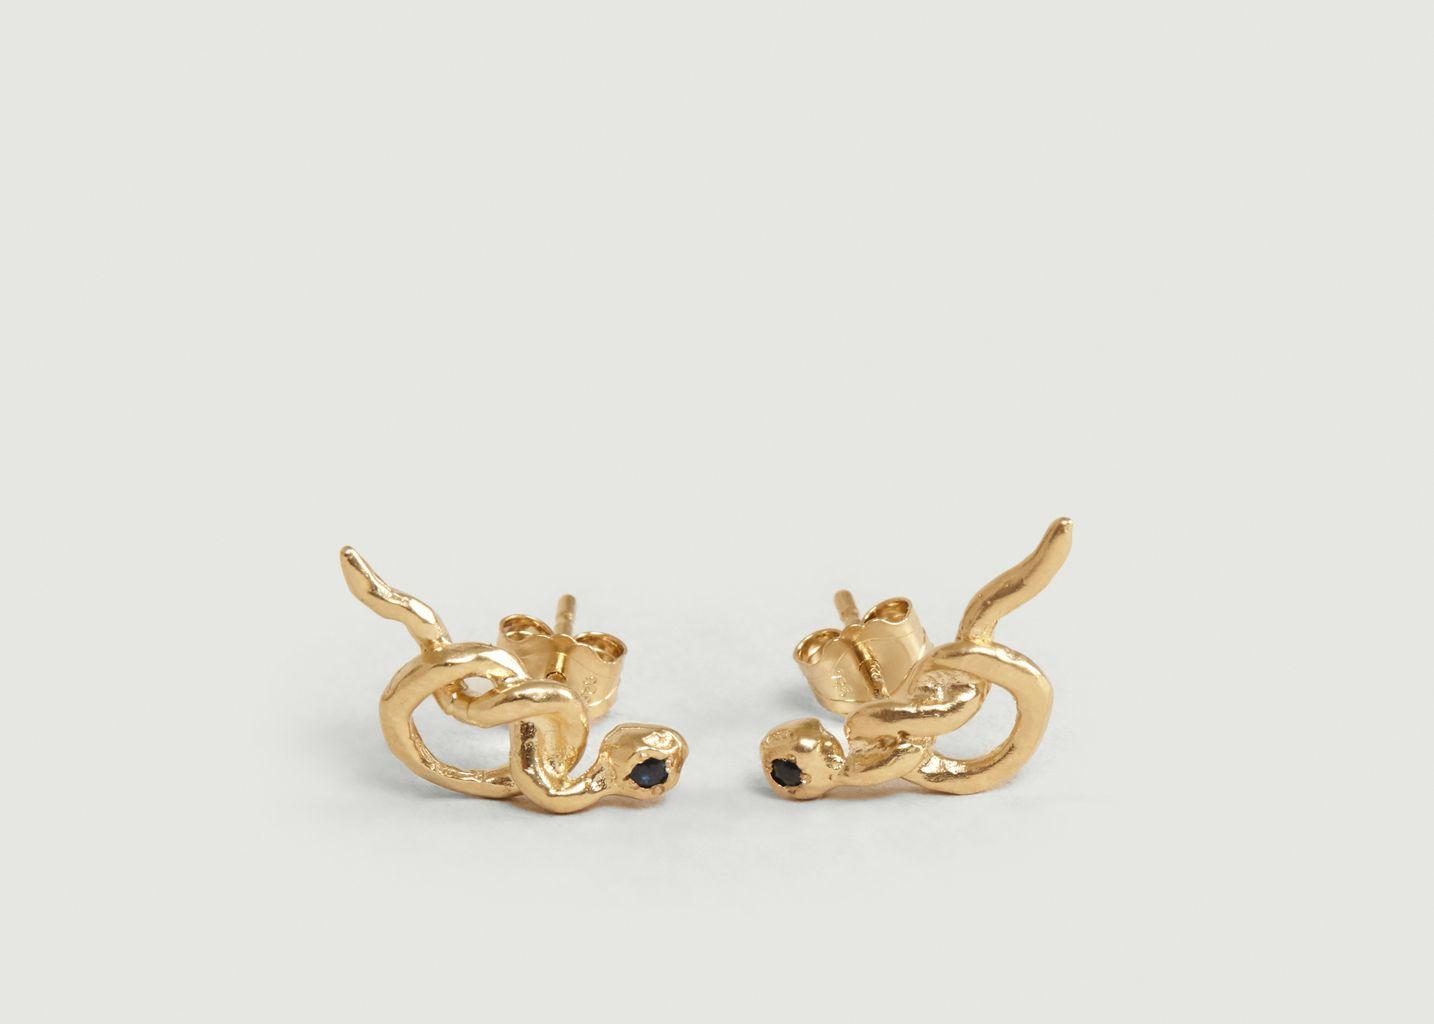 Boucles d'oreilles en vermeil Illy serties  - Monsieur